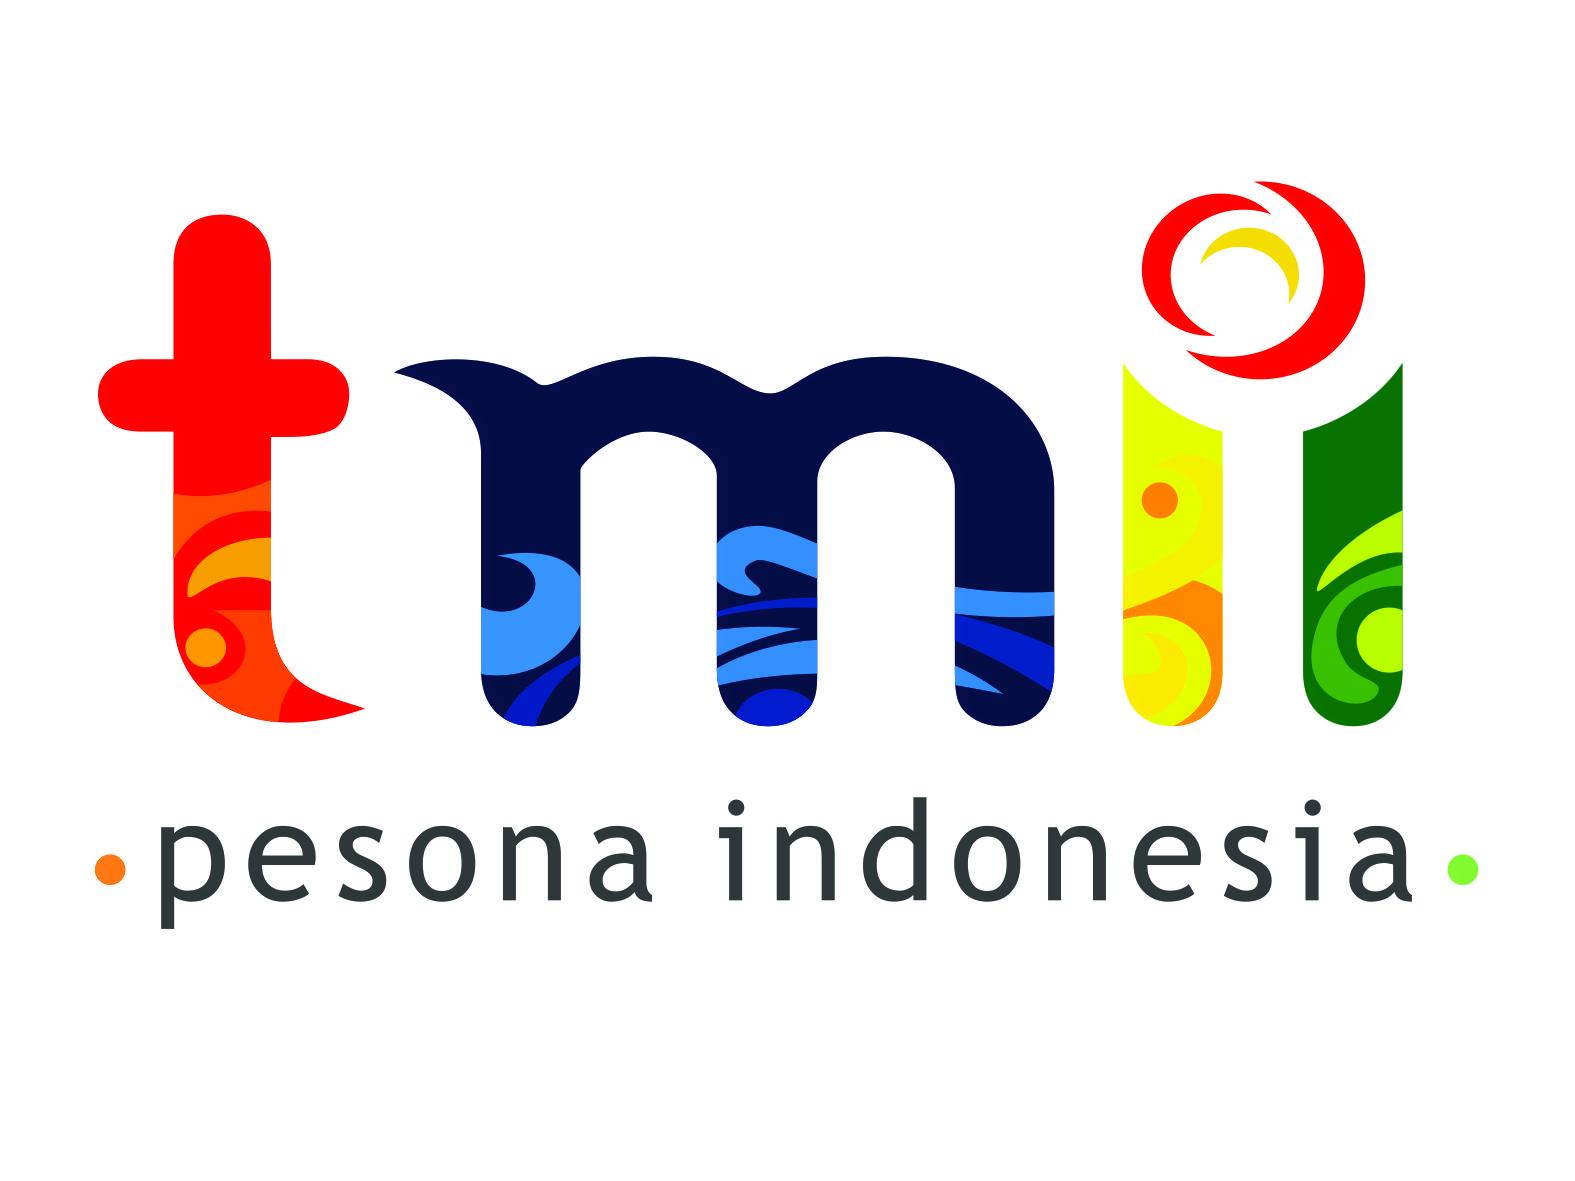 Logo Tmii Format Cdr Png Gudril Tempat Download Bisa Mendownload